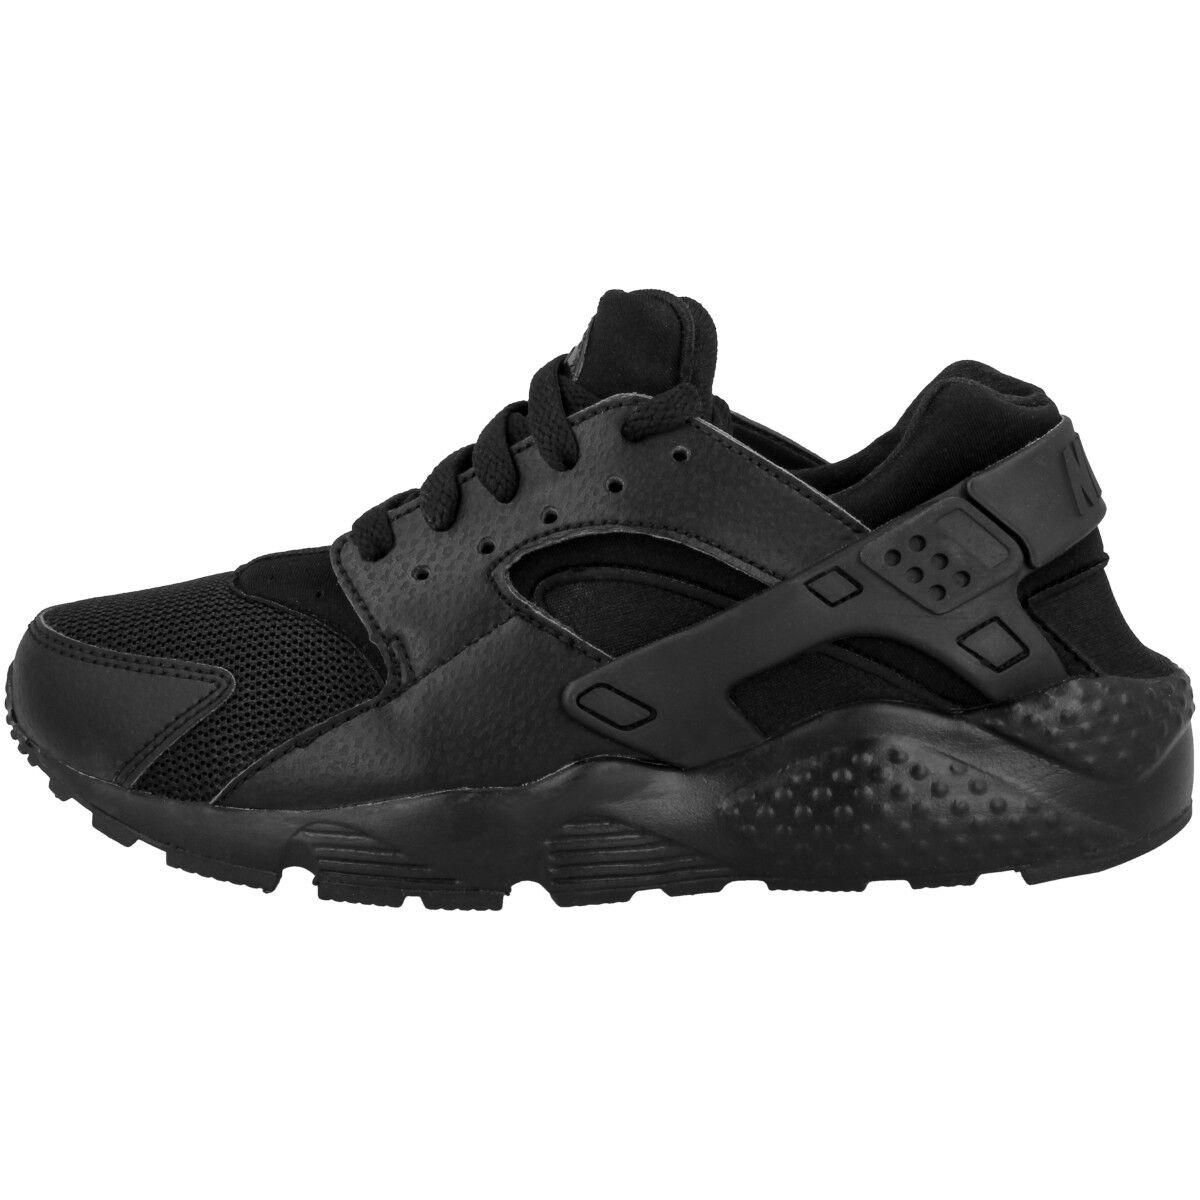 Nike Huarache Run GS GS Run 654275016 negro calzado 1a8c19